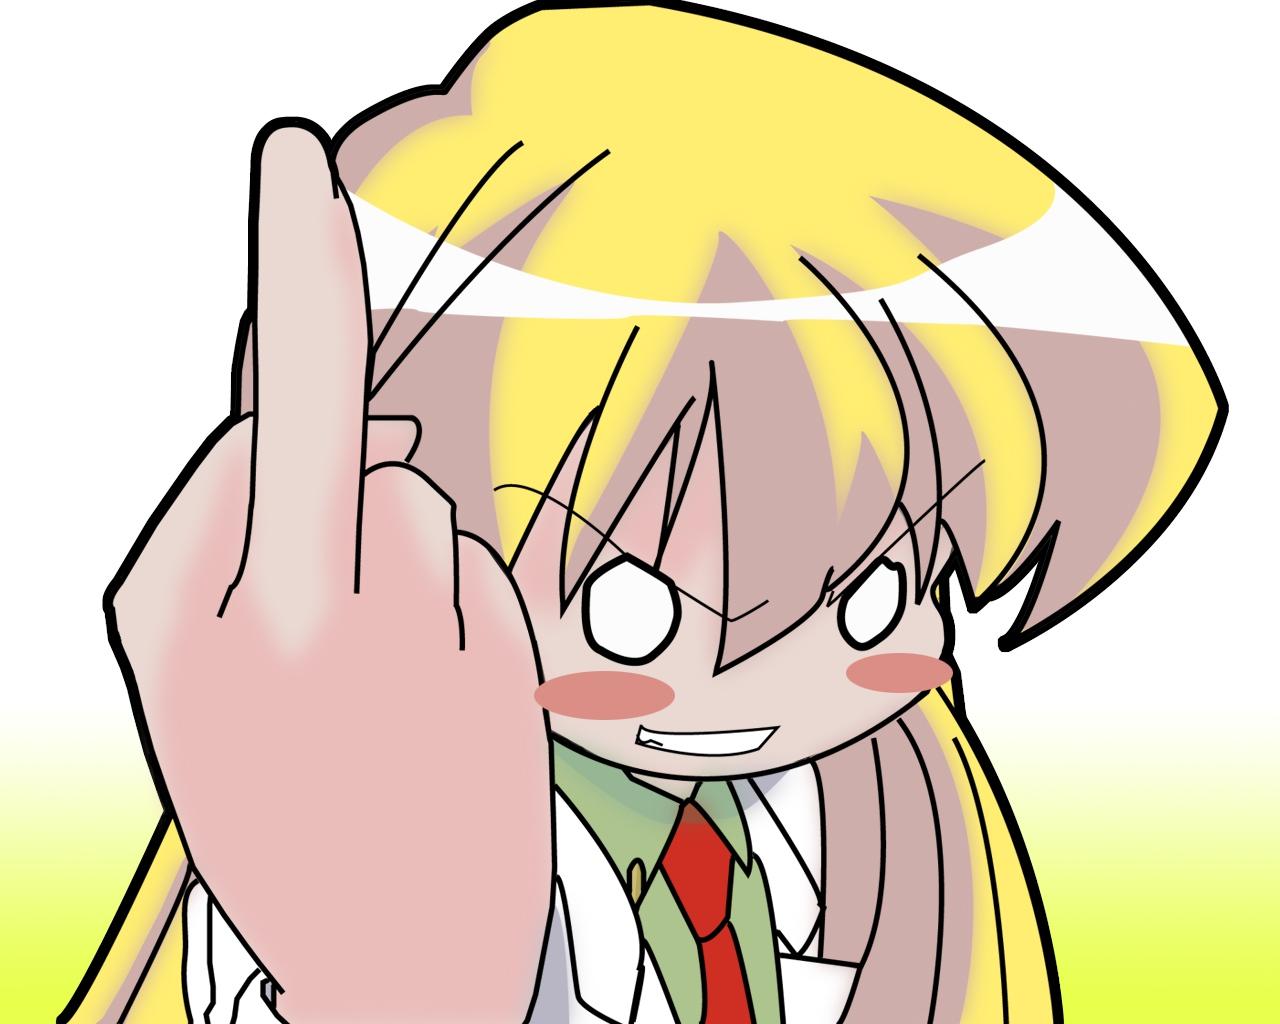 blush pani_poni_dash rebecca_miyamoto